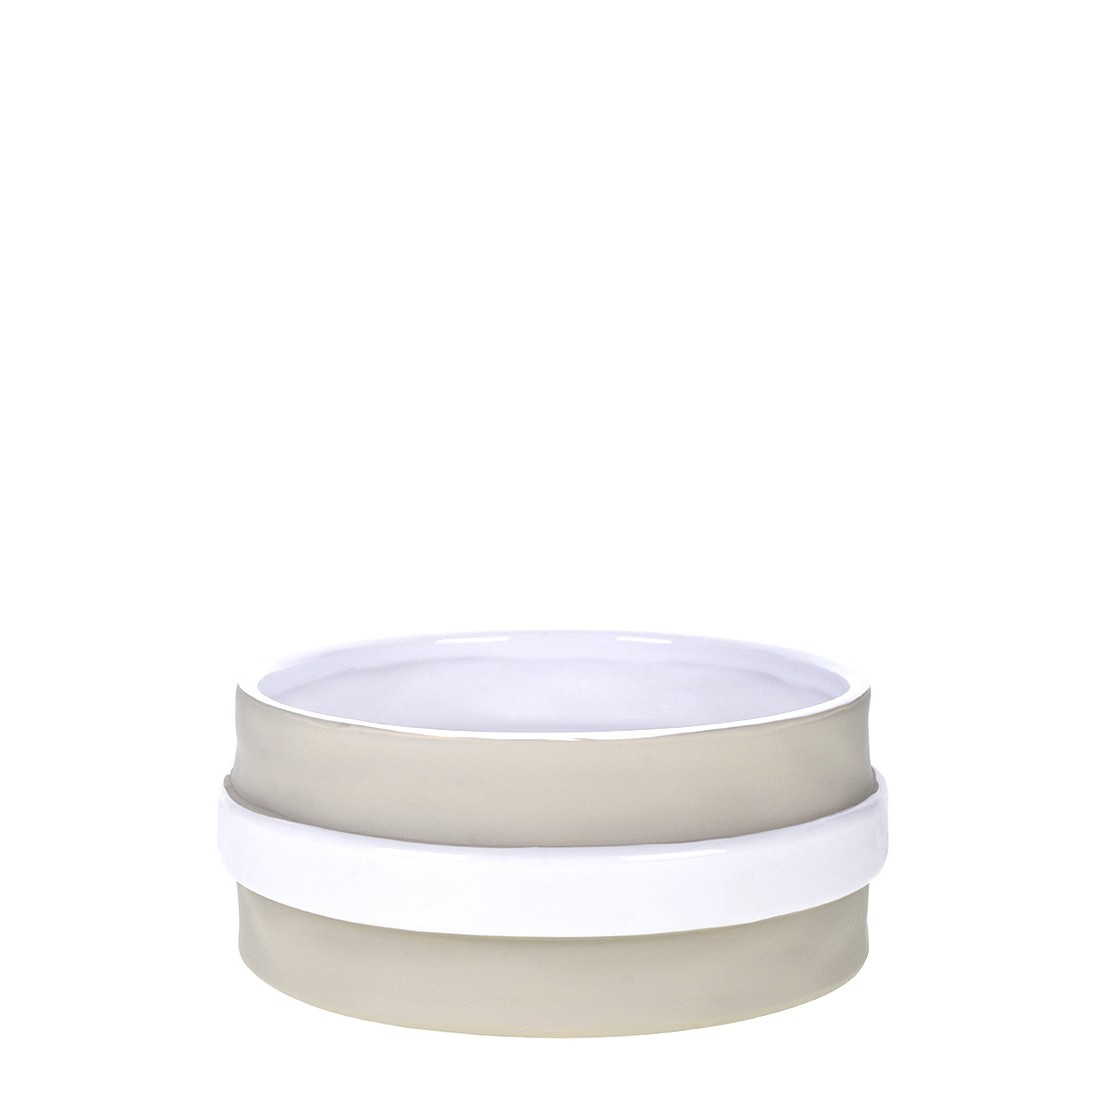 Vaso Decorativo de Ceramica Redondo 17cm Stone Branco